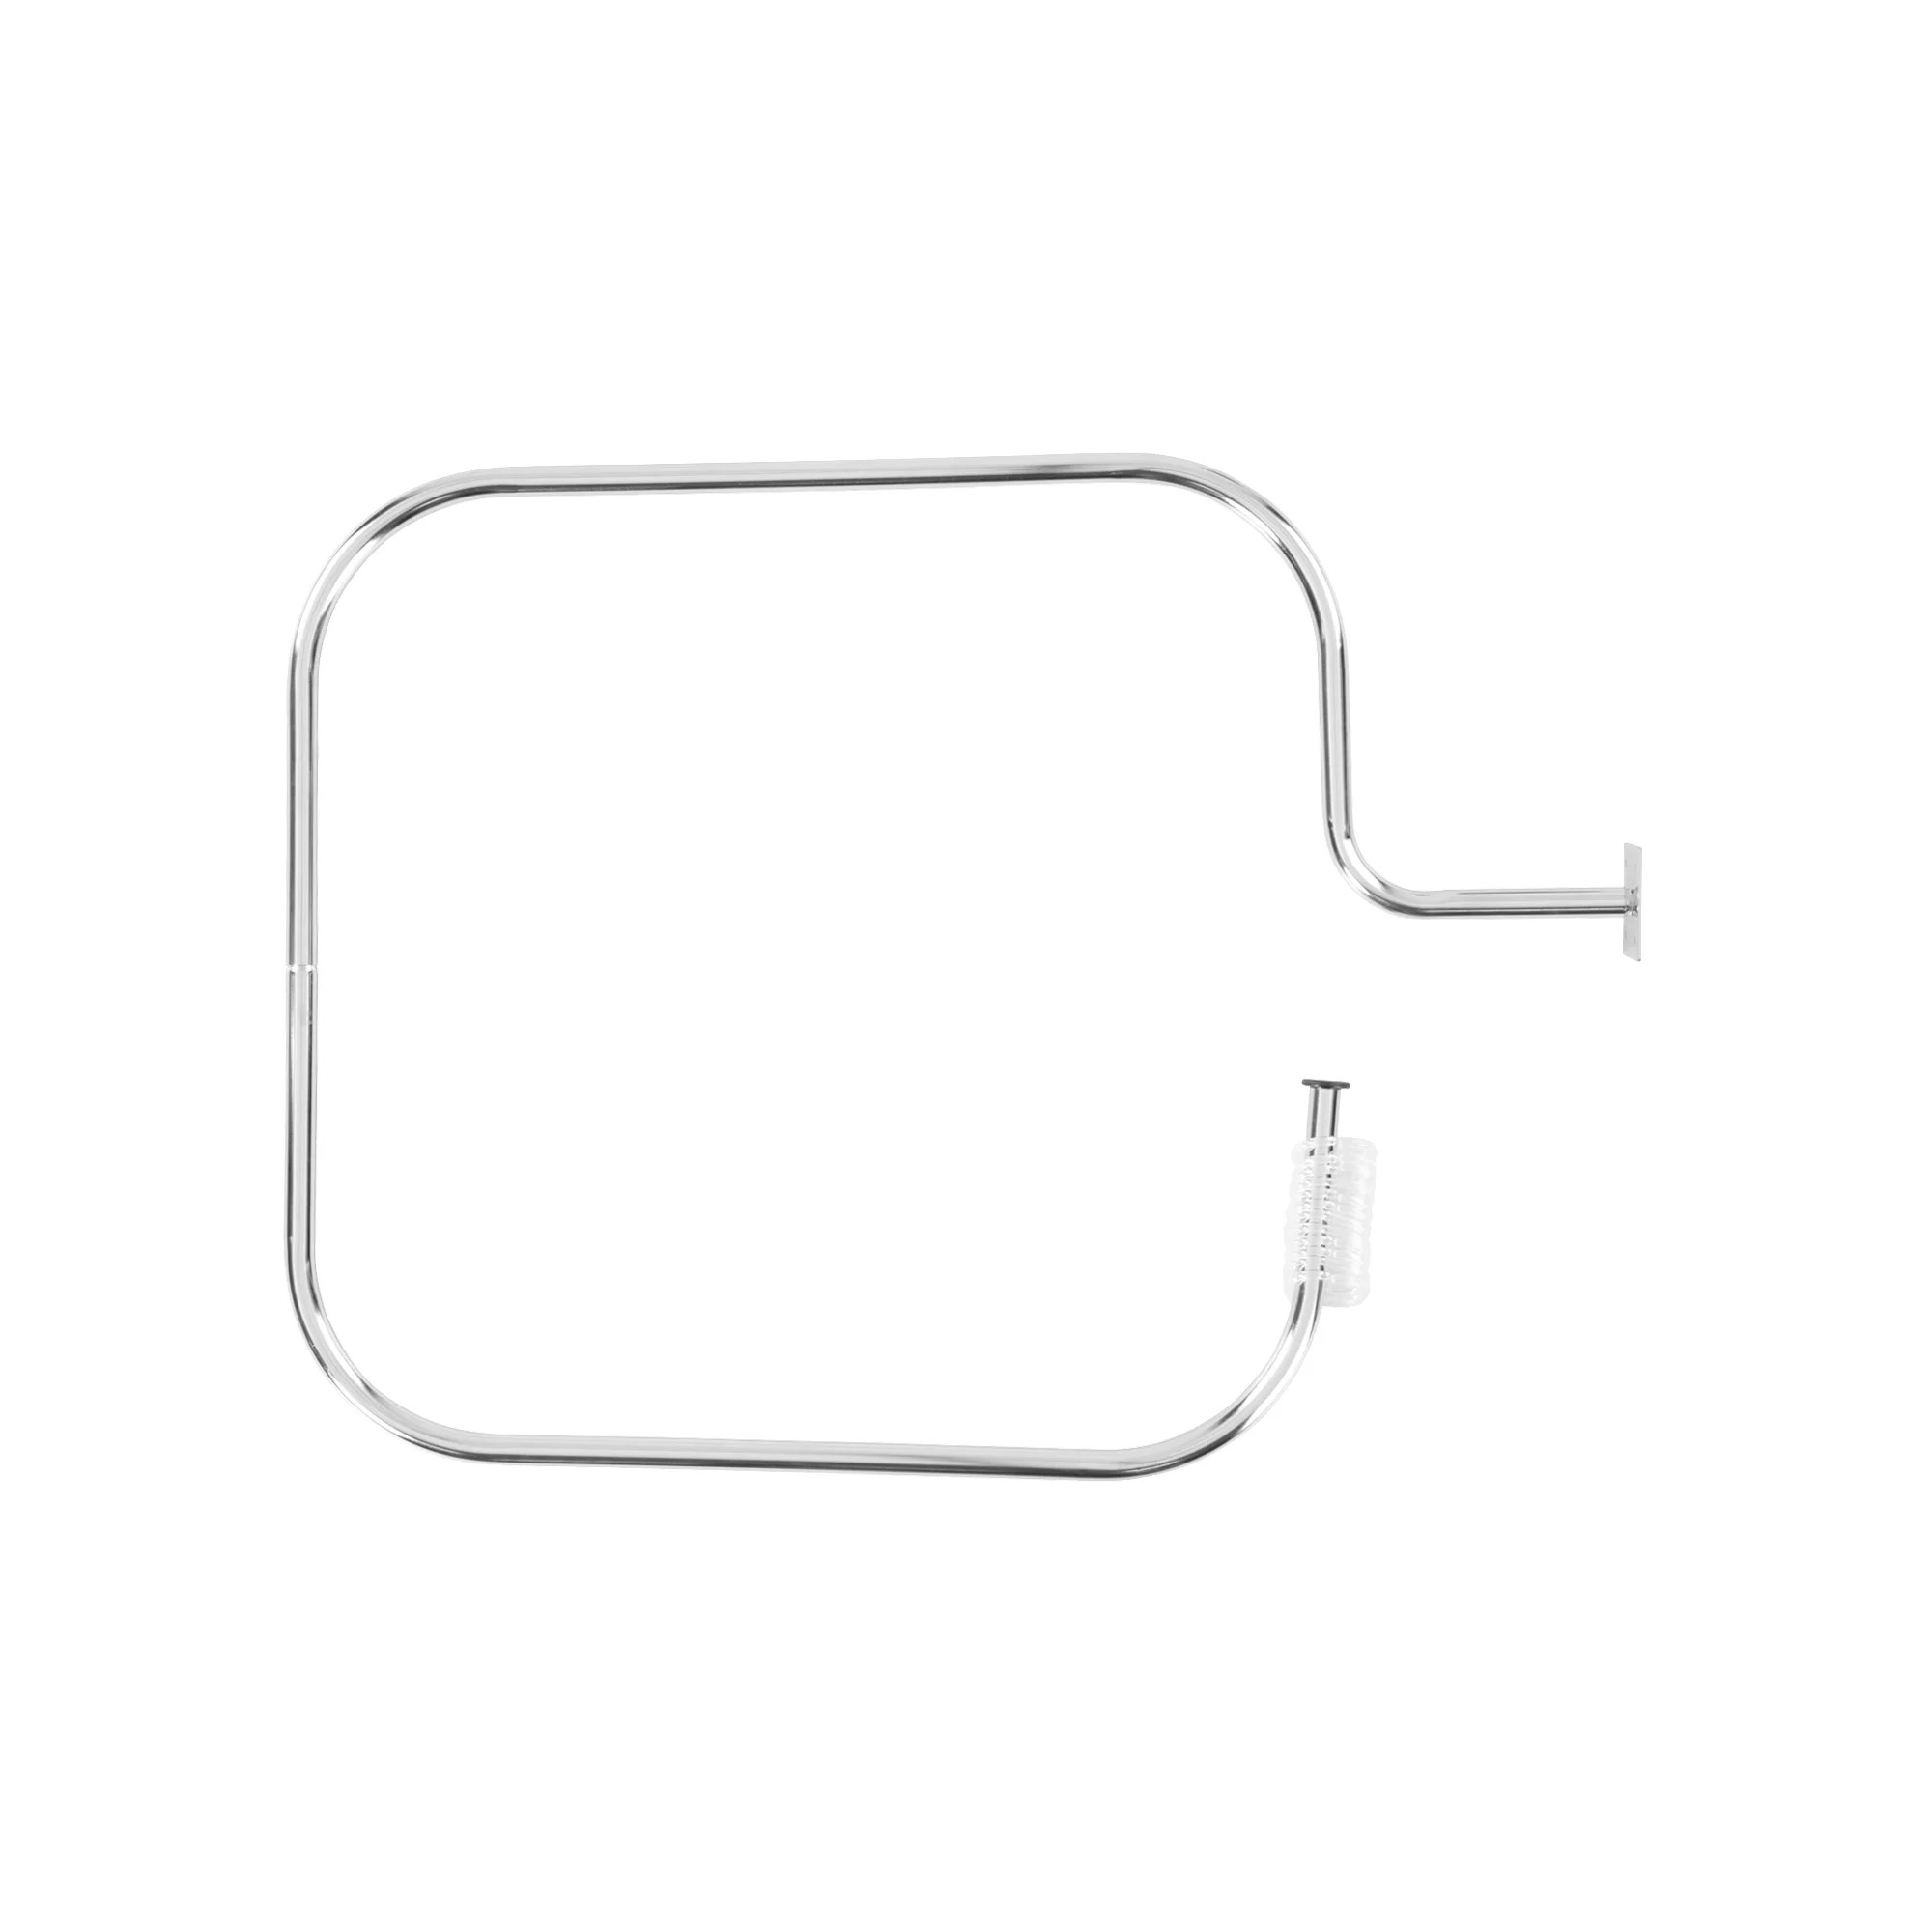 69cm rectangular fixed shower curtain rail ring set